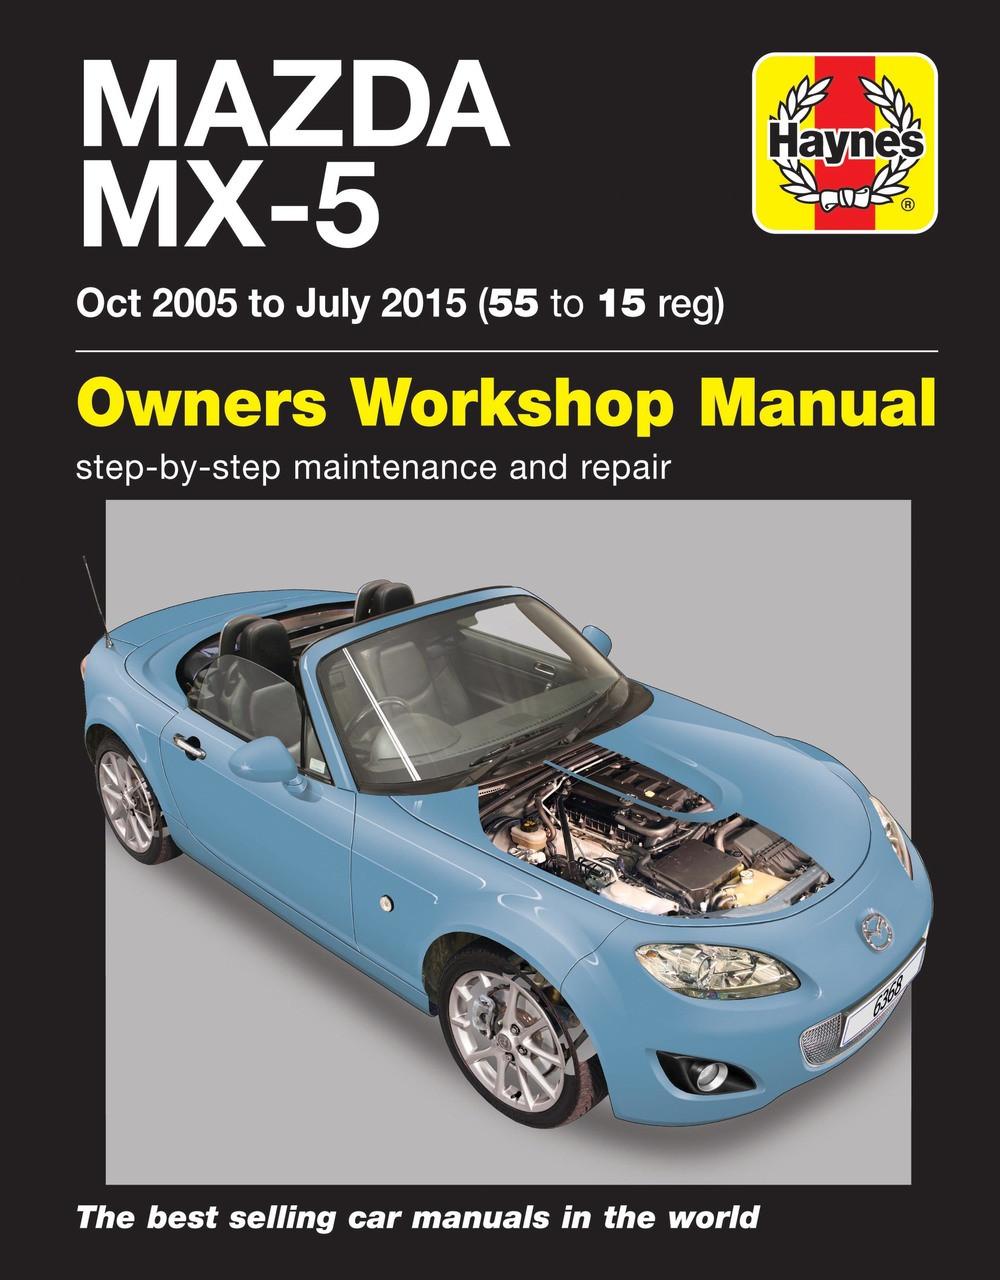 2004 mazdaspeed miata owners manual user manual guide u2022 rh fashionfilter co 2007 Mazda Miata 2004 Mazda Mazdaspeed Miata